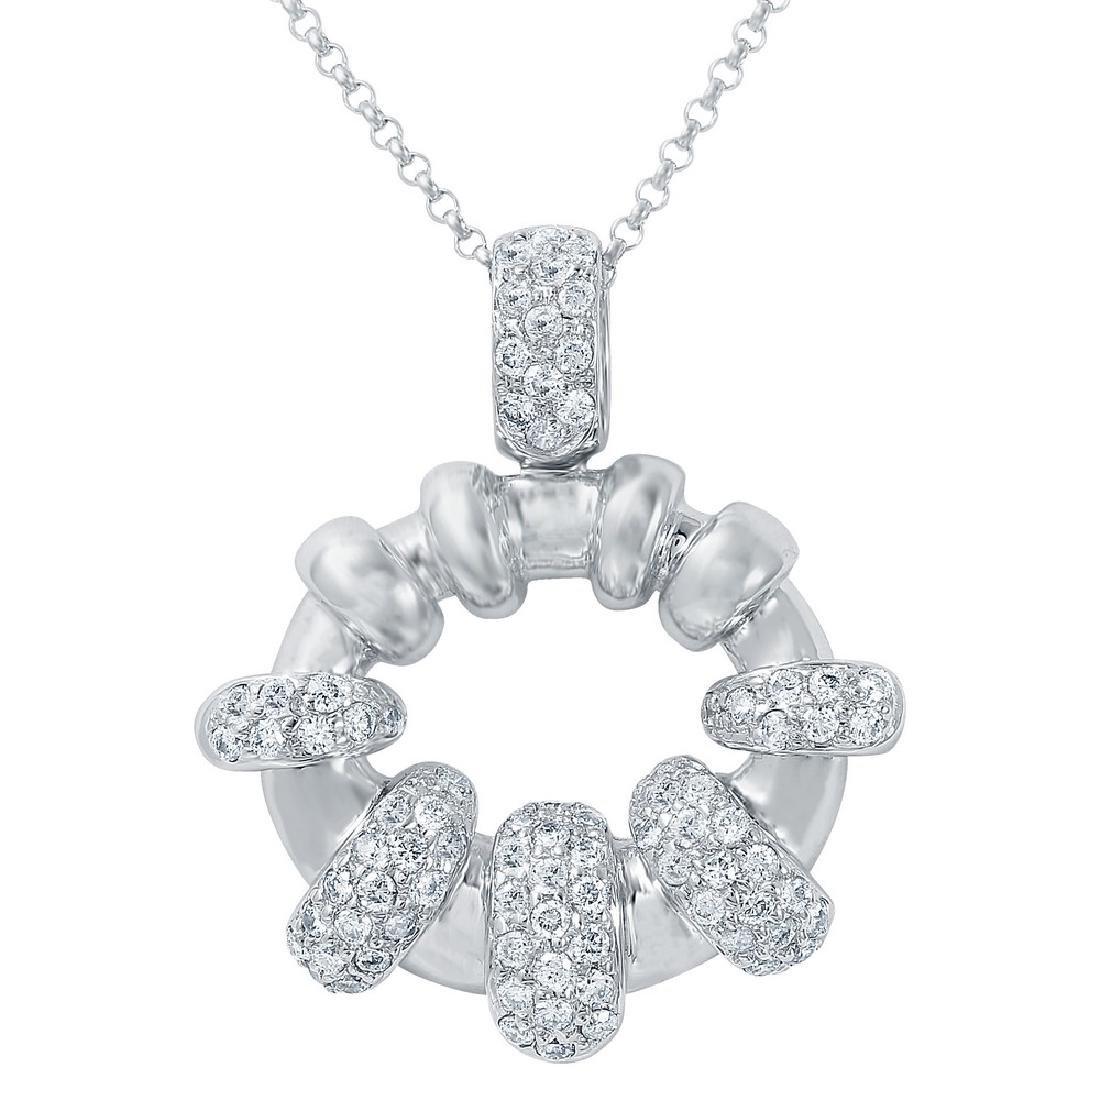 Genuine 0.71 TCW 14K White Gold Ladies Necklace